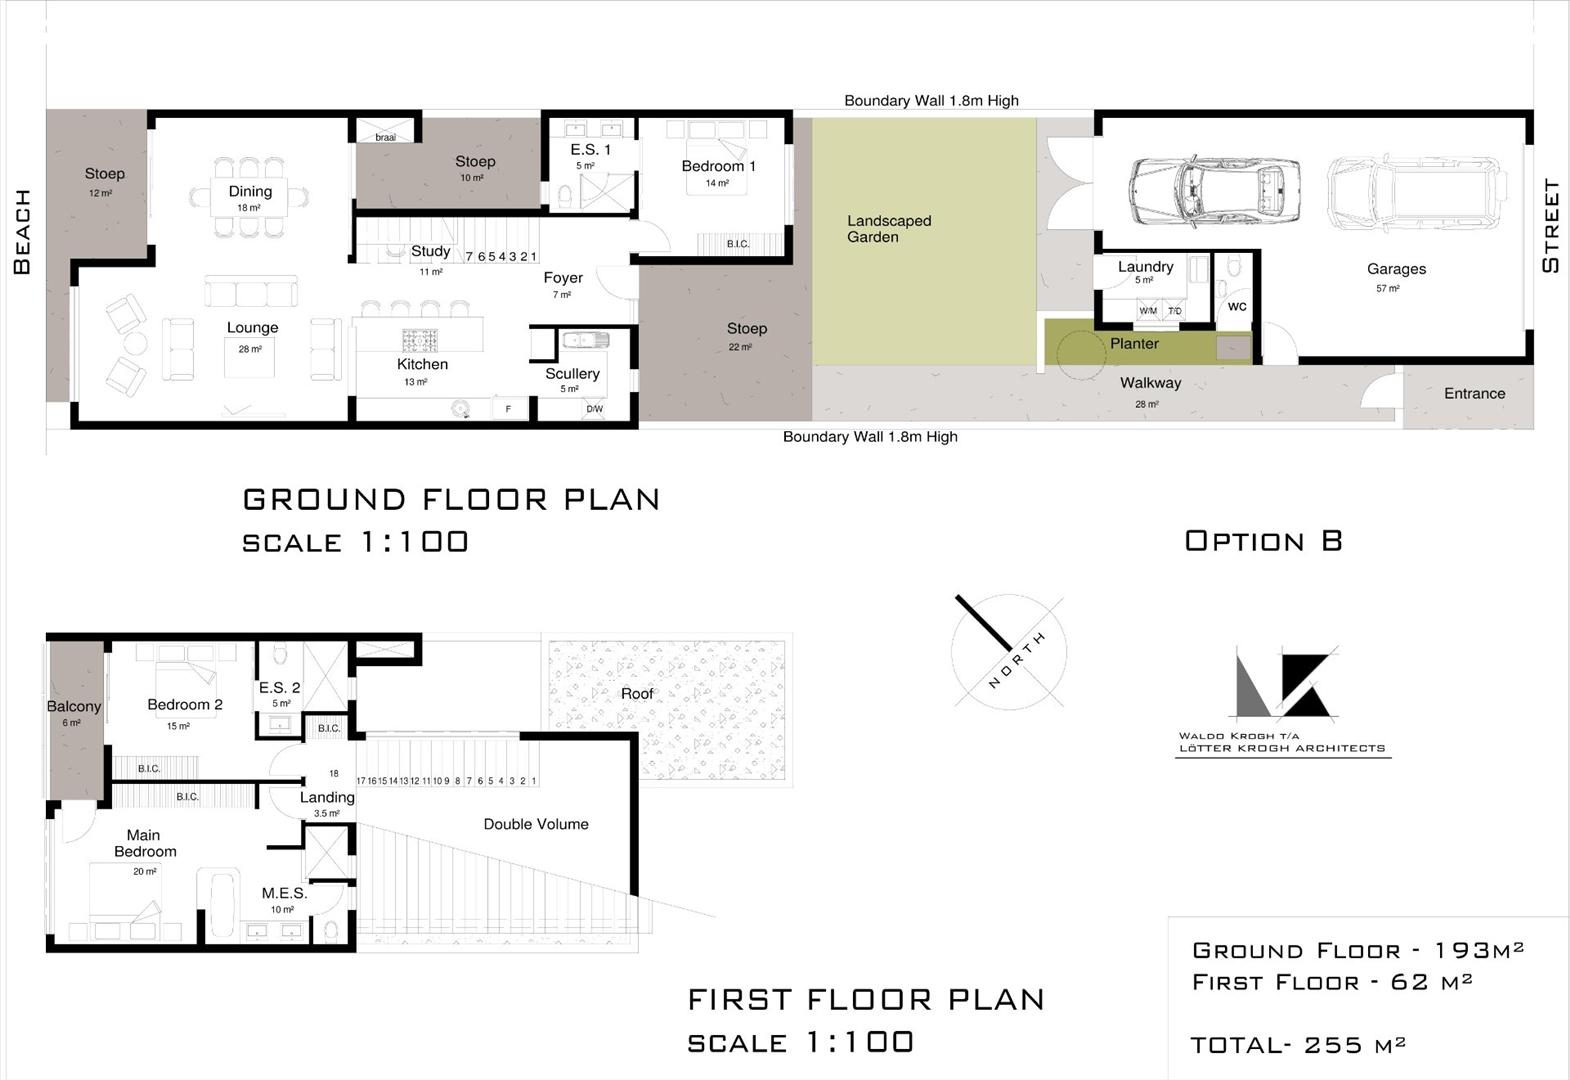 Option B floor plan